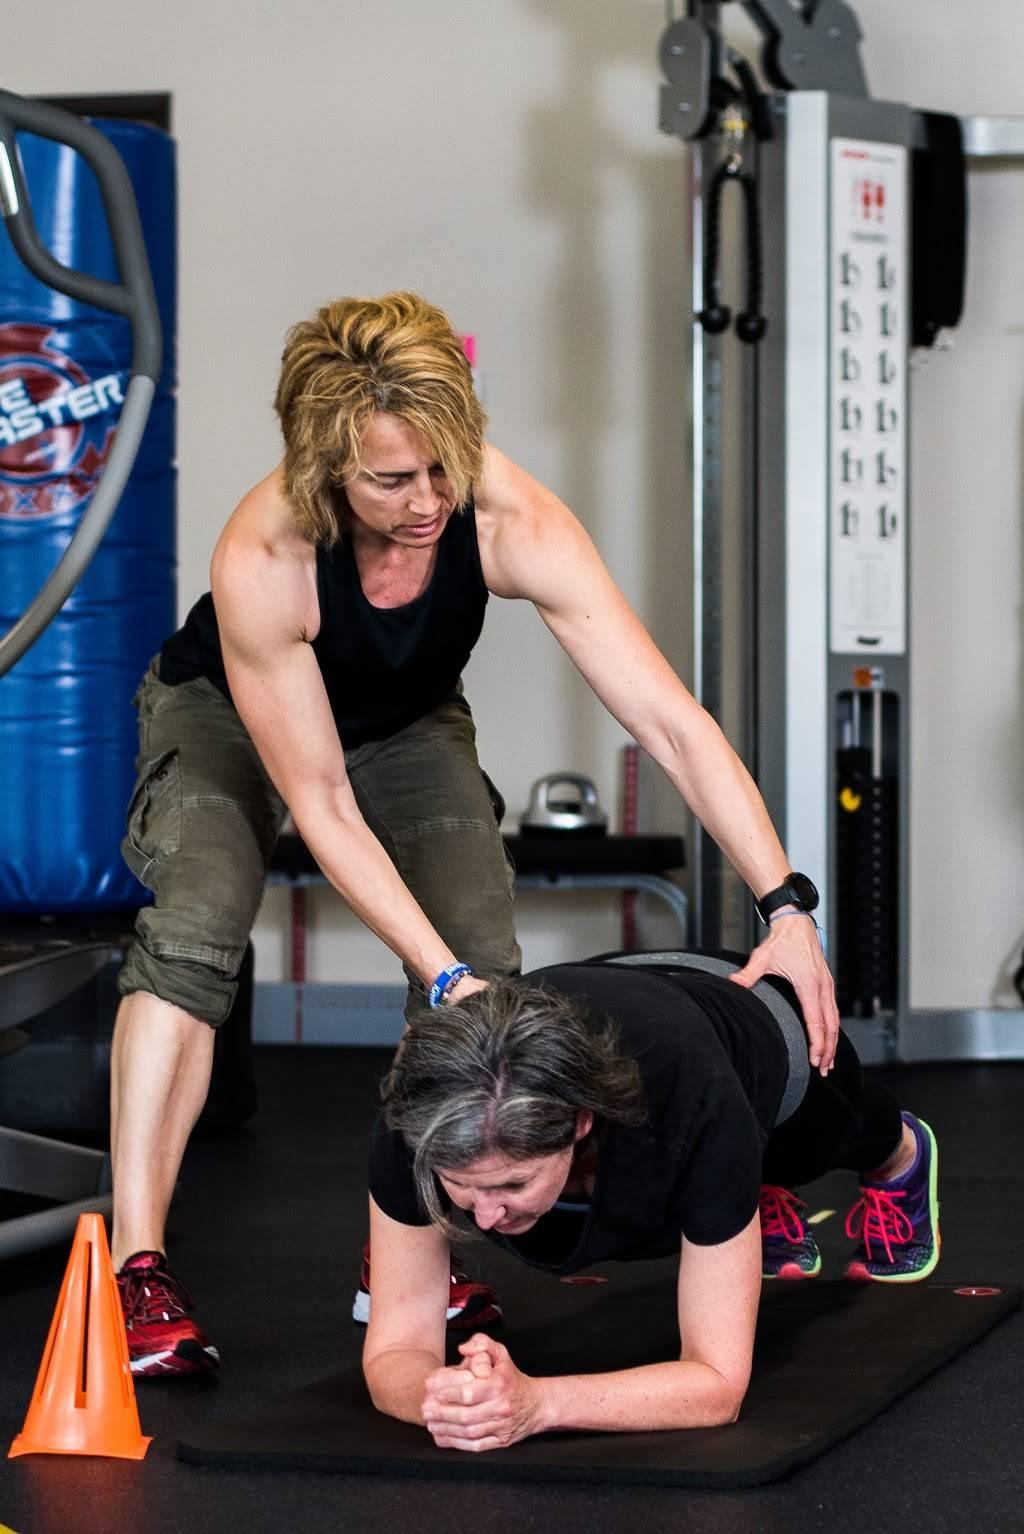 IGive100 Fitness - health  | Photo 6 of 7 | Address: 320 W Broadway b, Monona, WI 53716, USA | Phone: (608) 212-2227